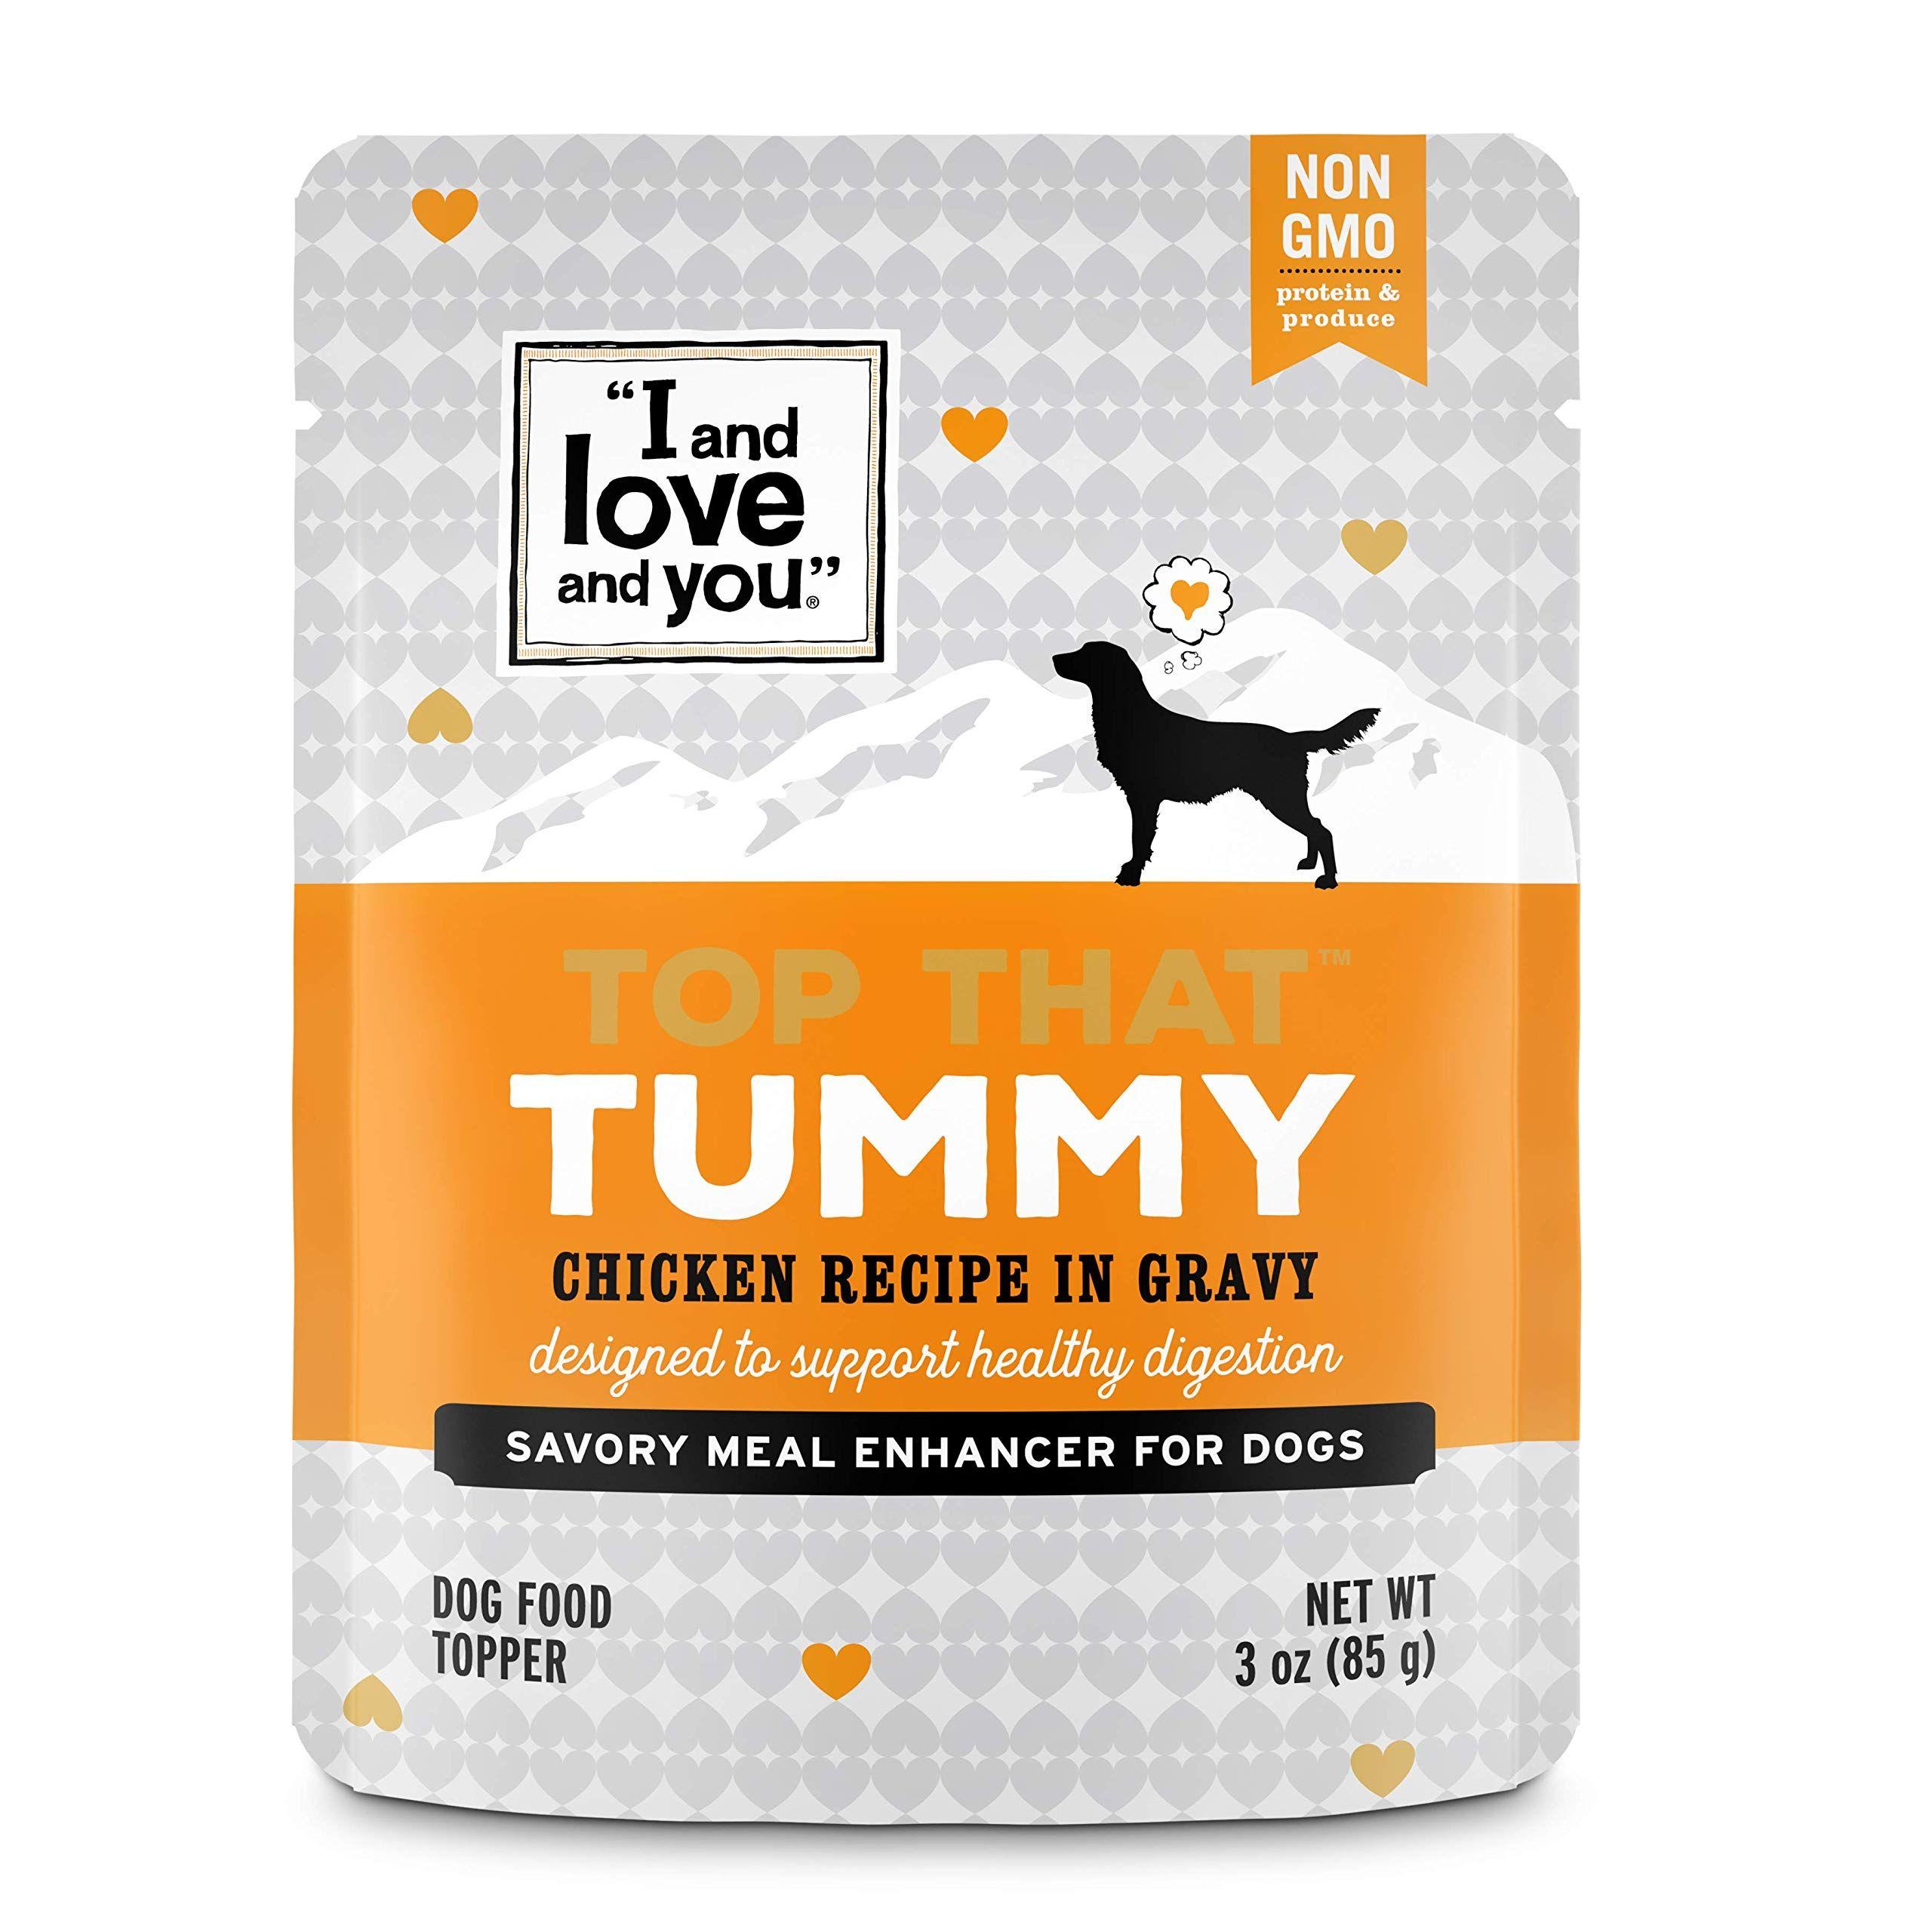 simply nourish puppy food wet